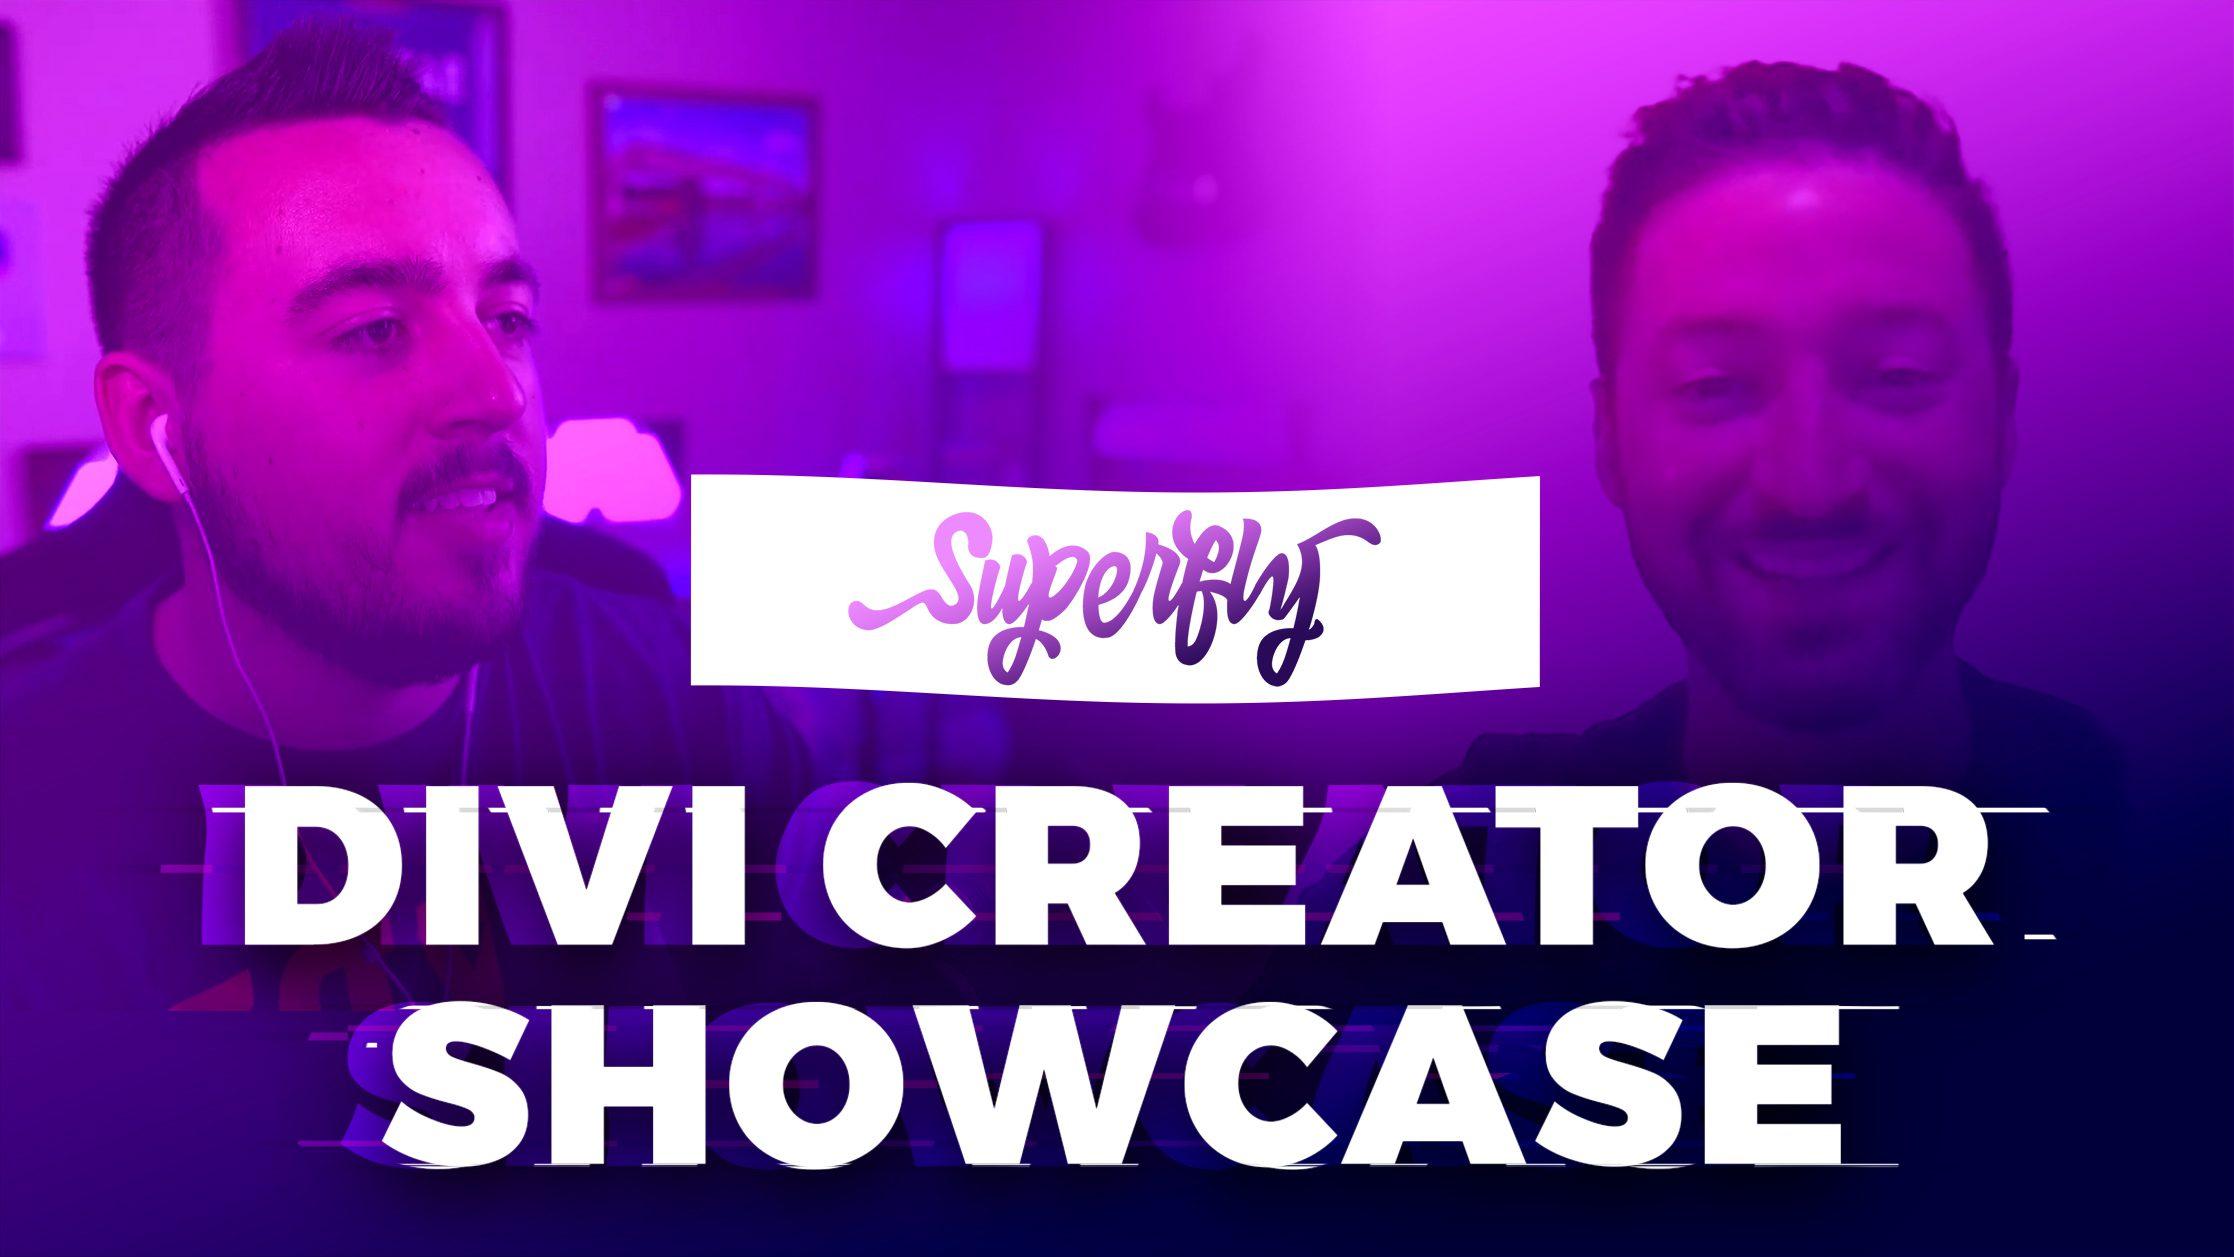 Divi Creator Showcase: Superfly